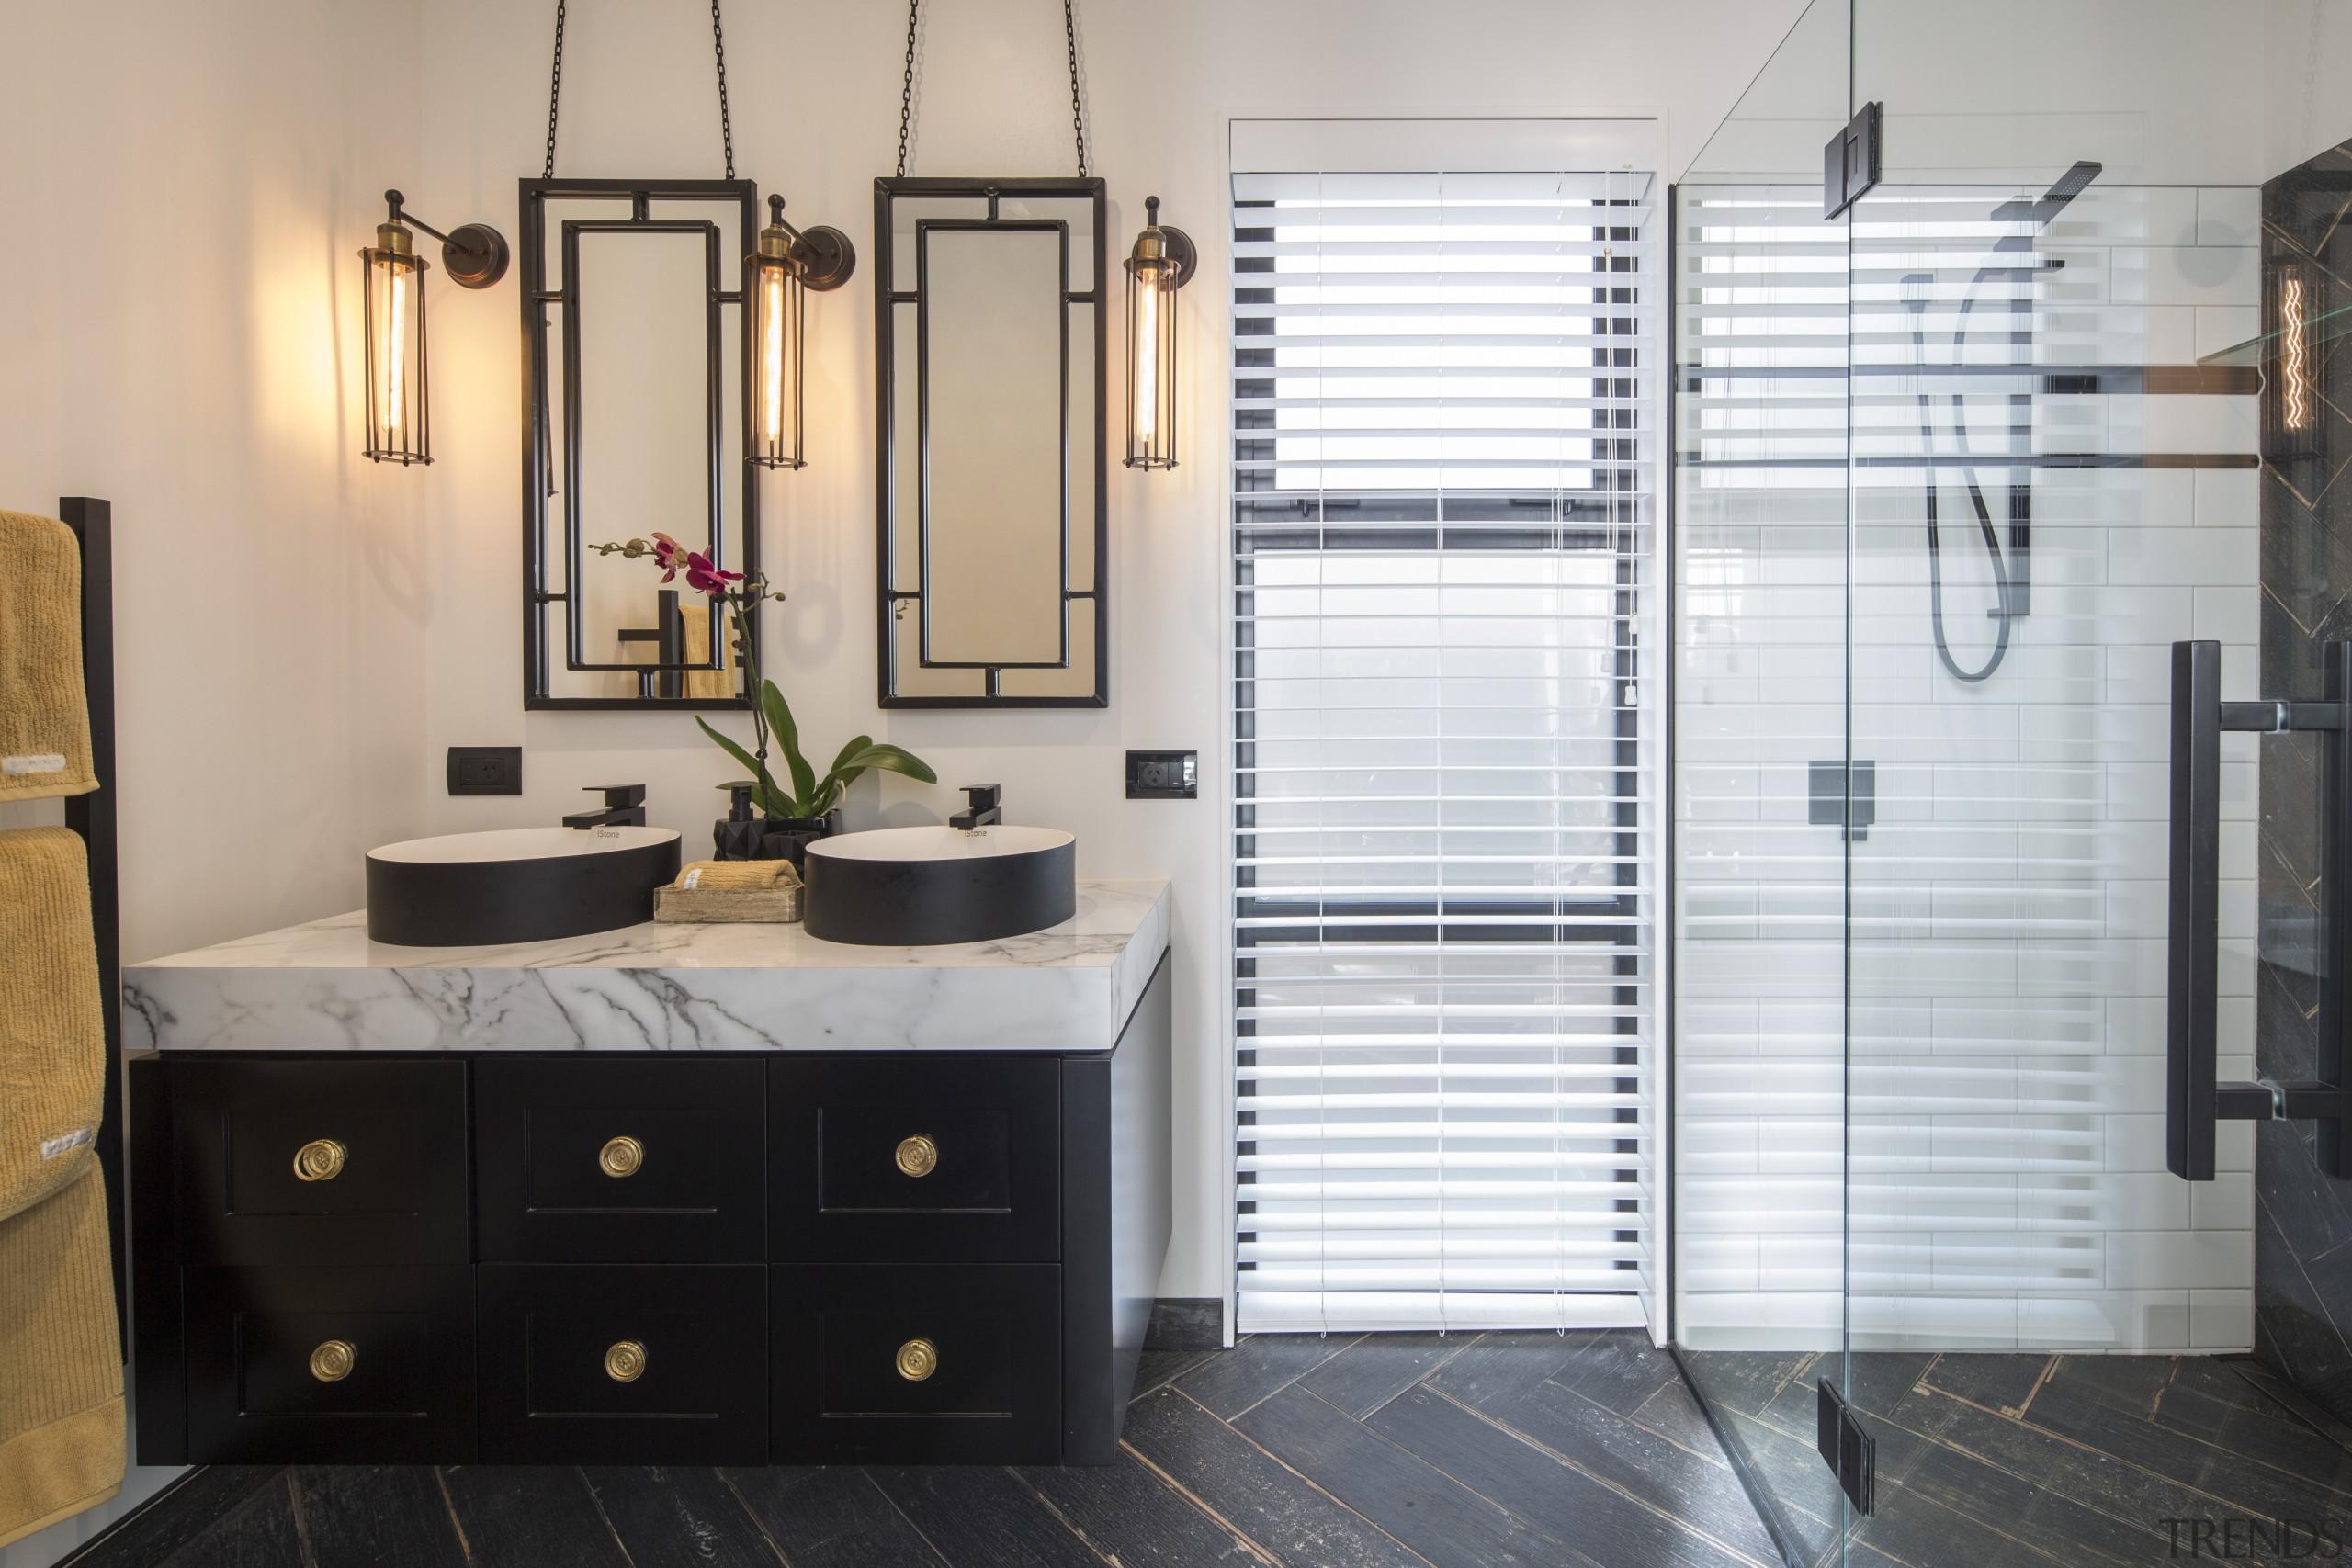 This his-and-hers ensuite vanity was custom designed by bathroom, floor, flooring, interior design, room, gray